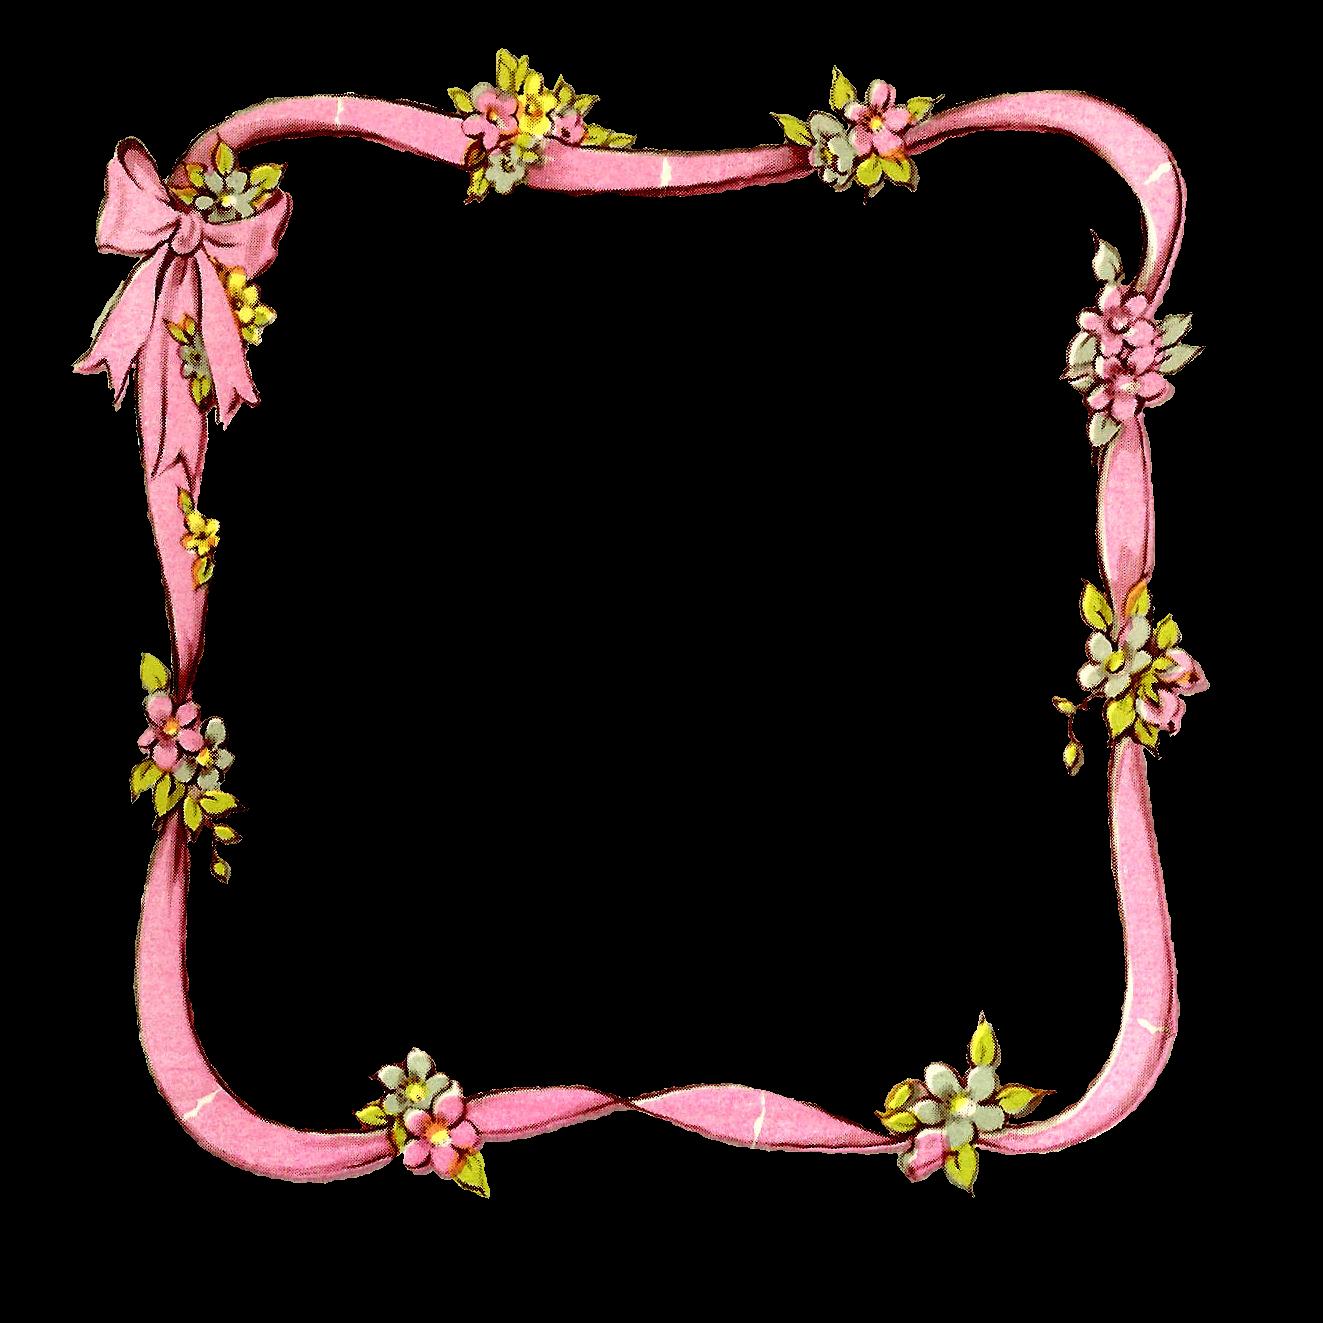 Antique images digital ribbon. Frames clipart baby girl